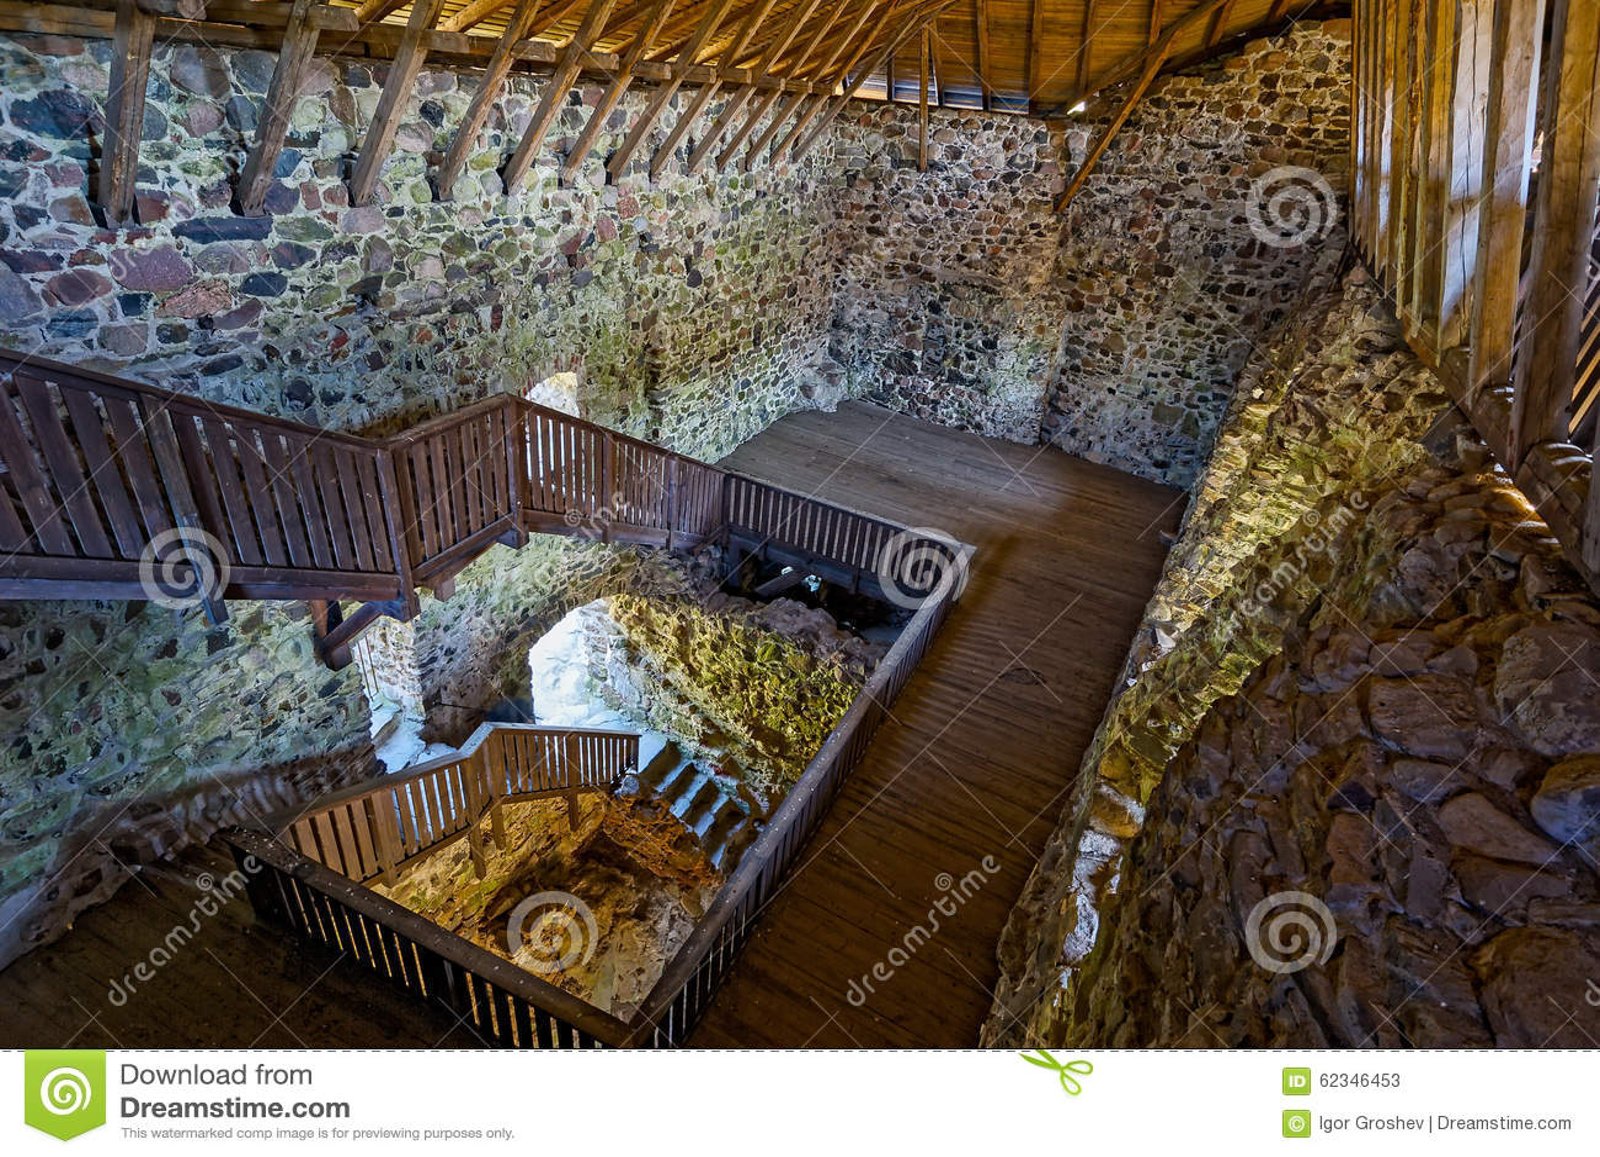 medieval castle interior stock image image of fort medieval 62346453